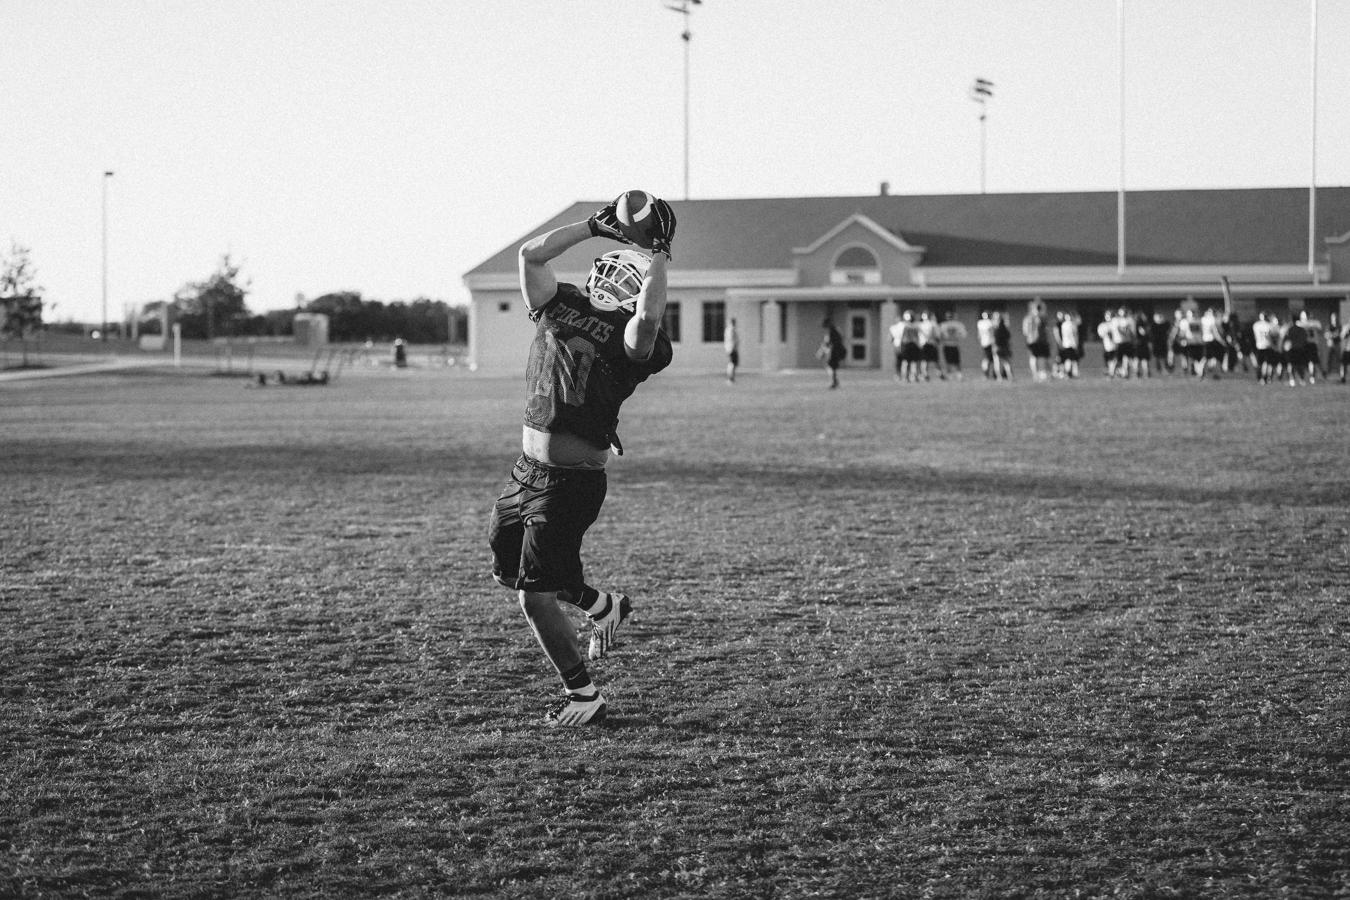 sufootball14-practice-187.jpg